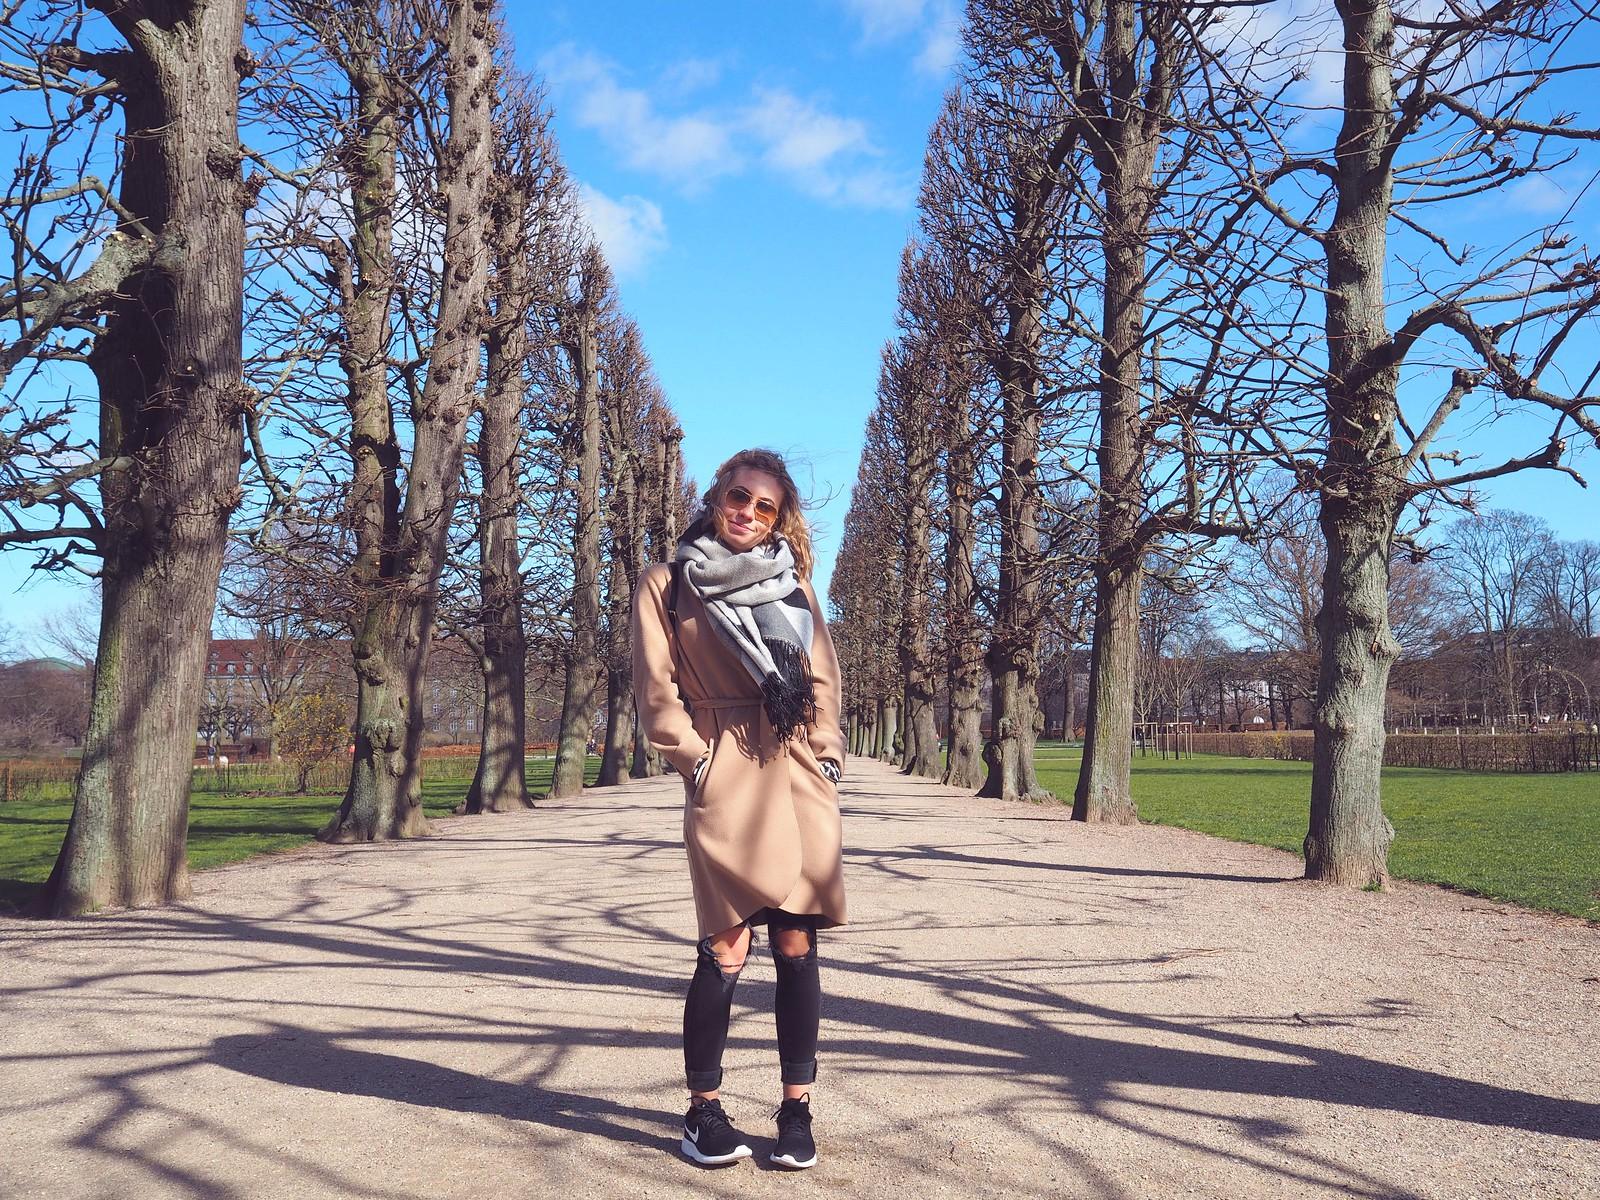 copengahen roseborg slot park